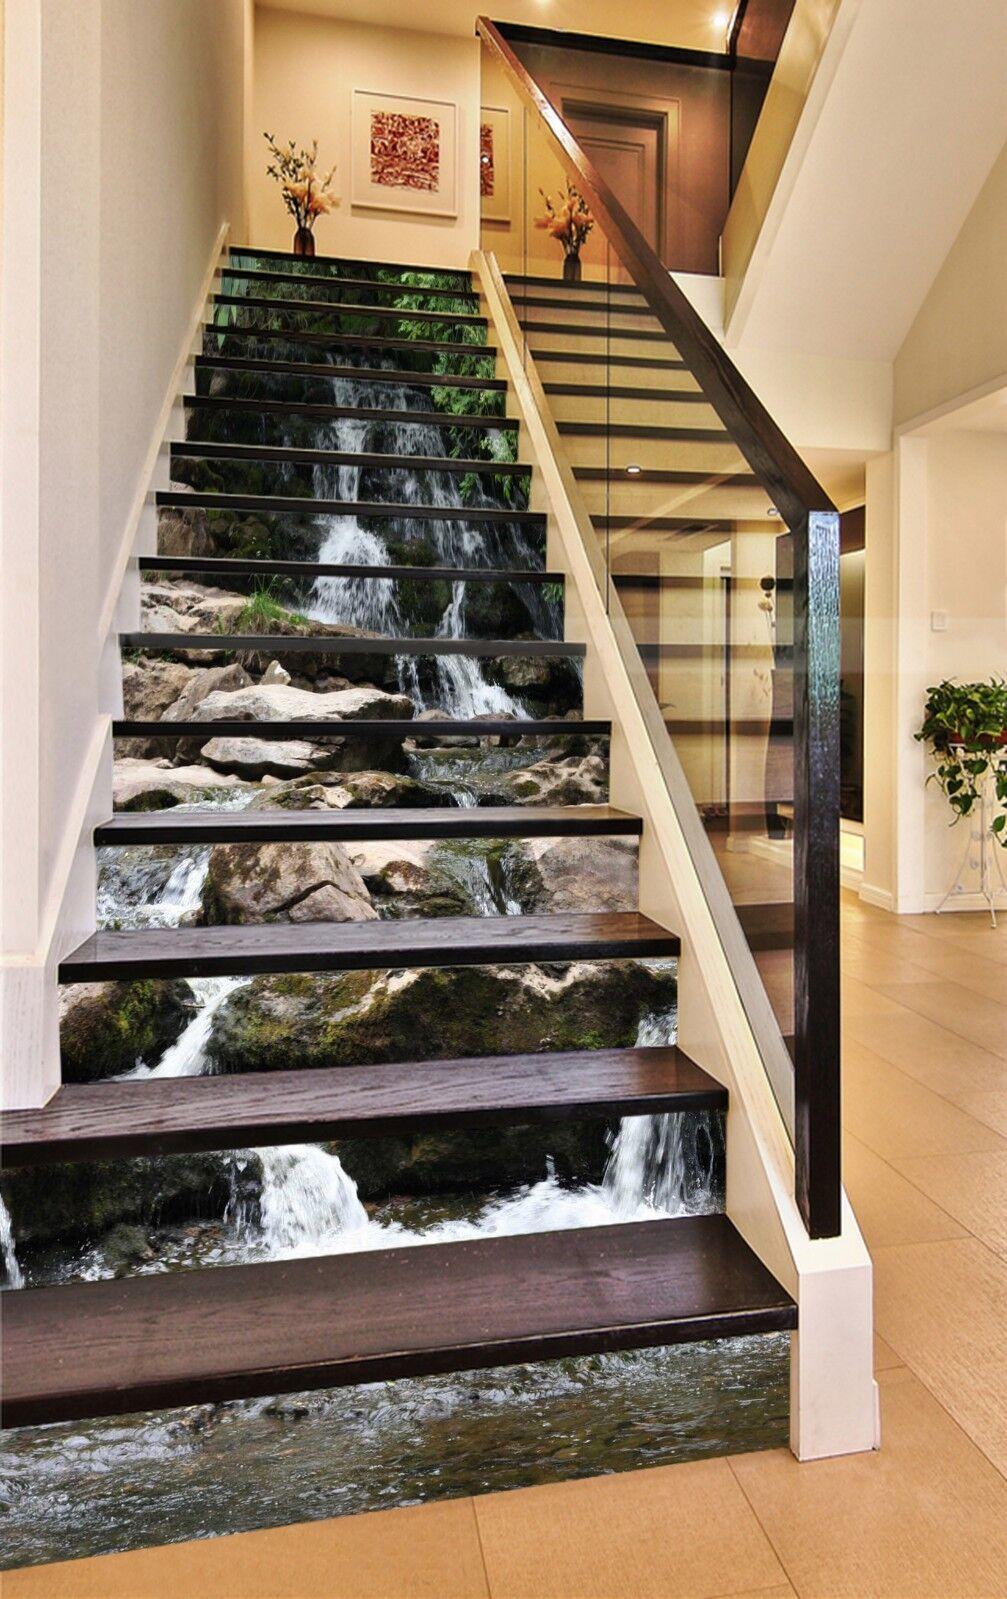 3D Stone Stream 9 Stair Risers Decoration Photo Mural Vinyl Decal Wallpaper CA